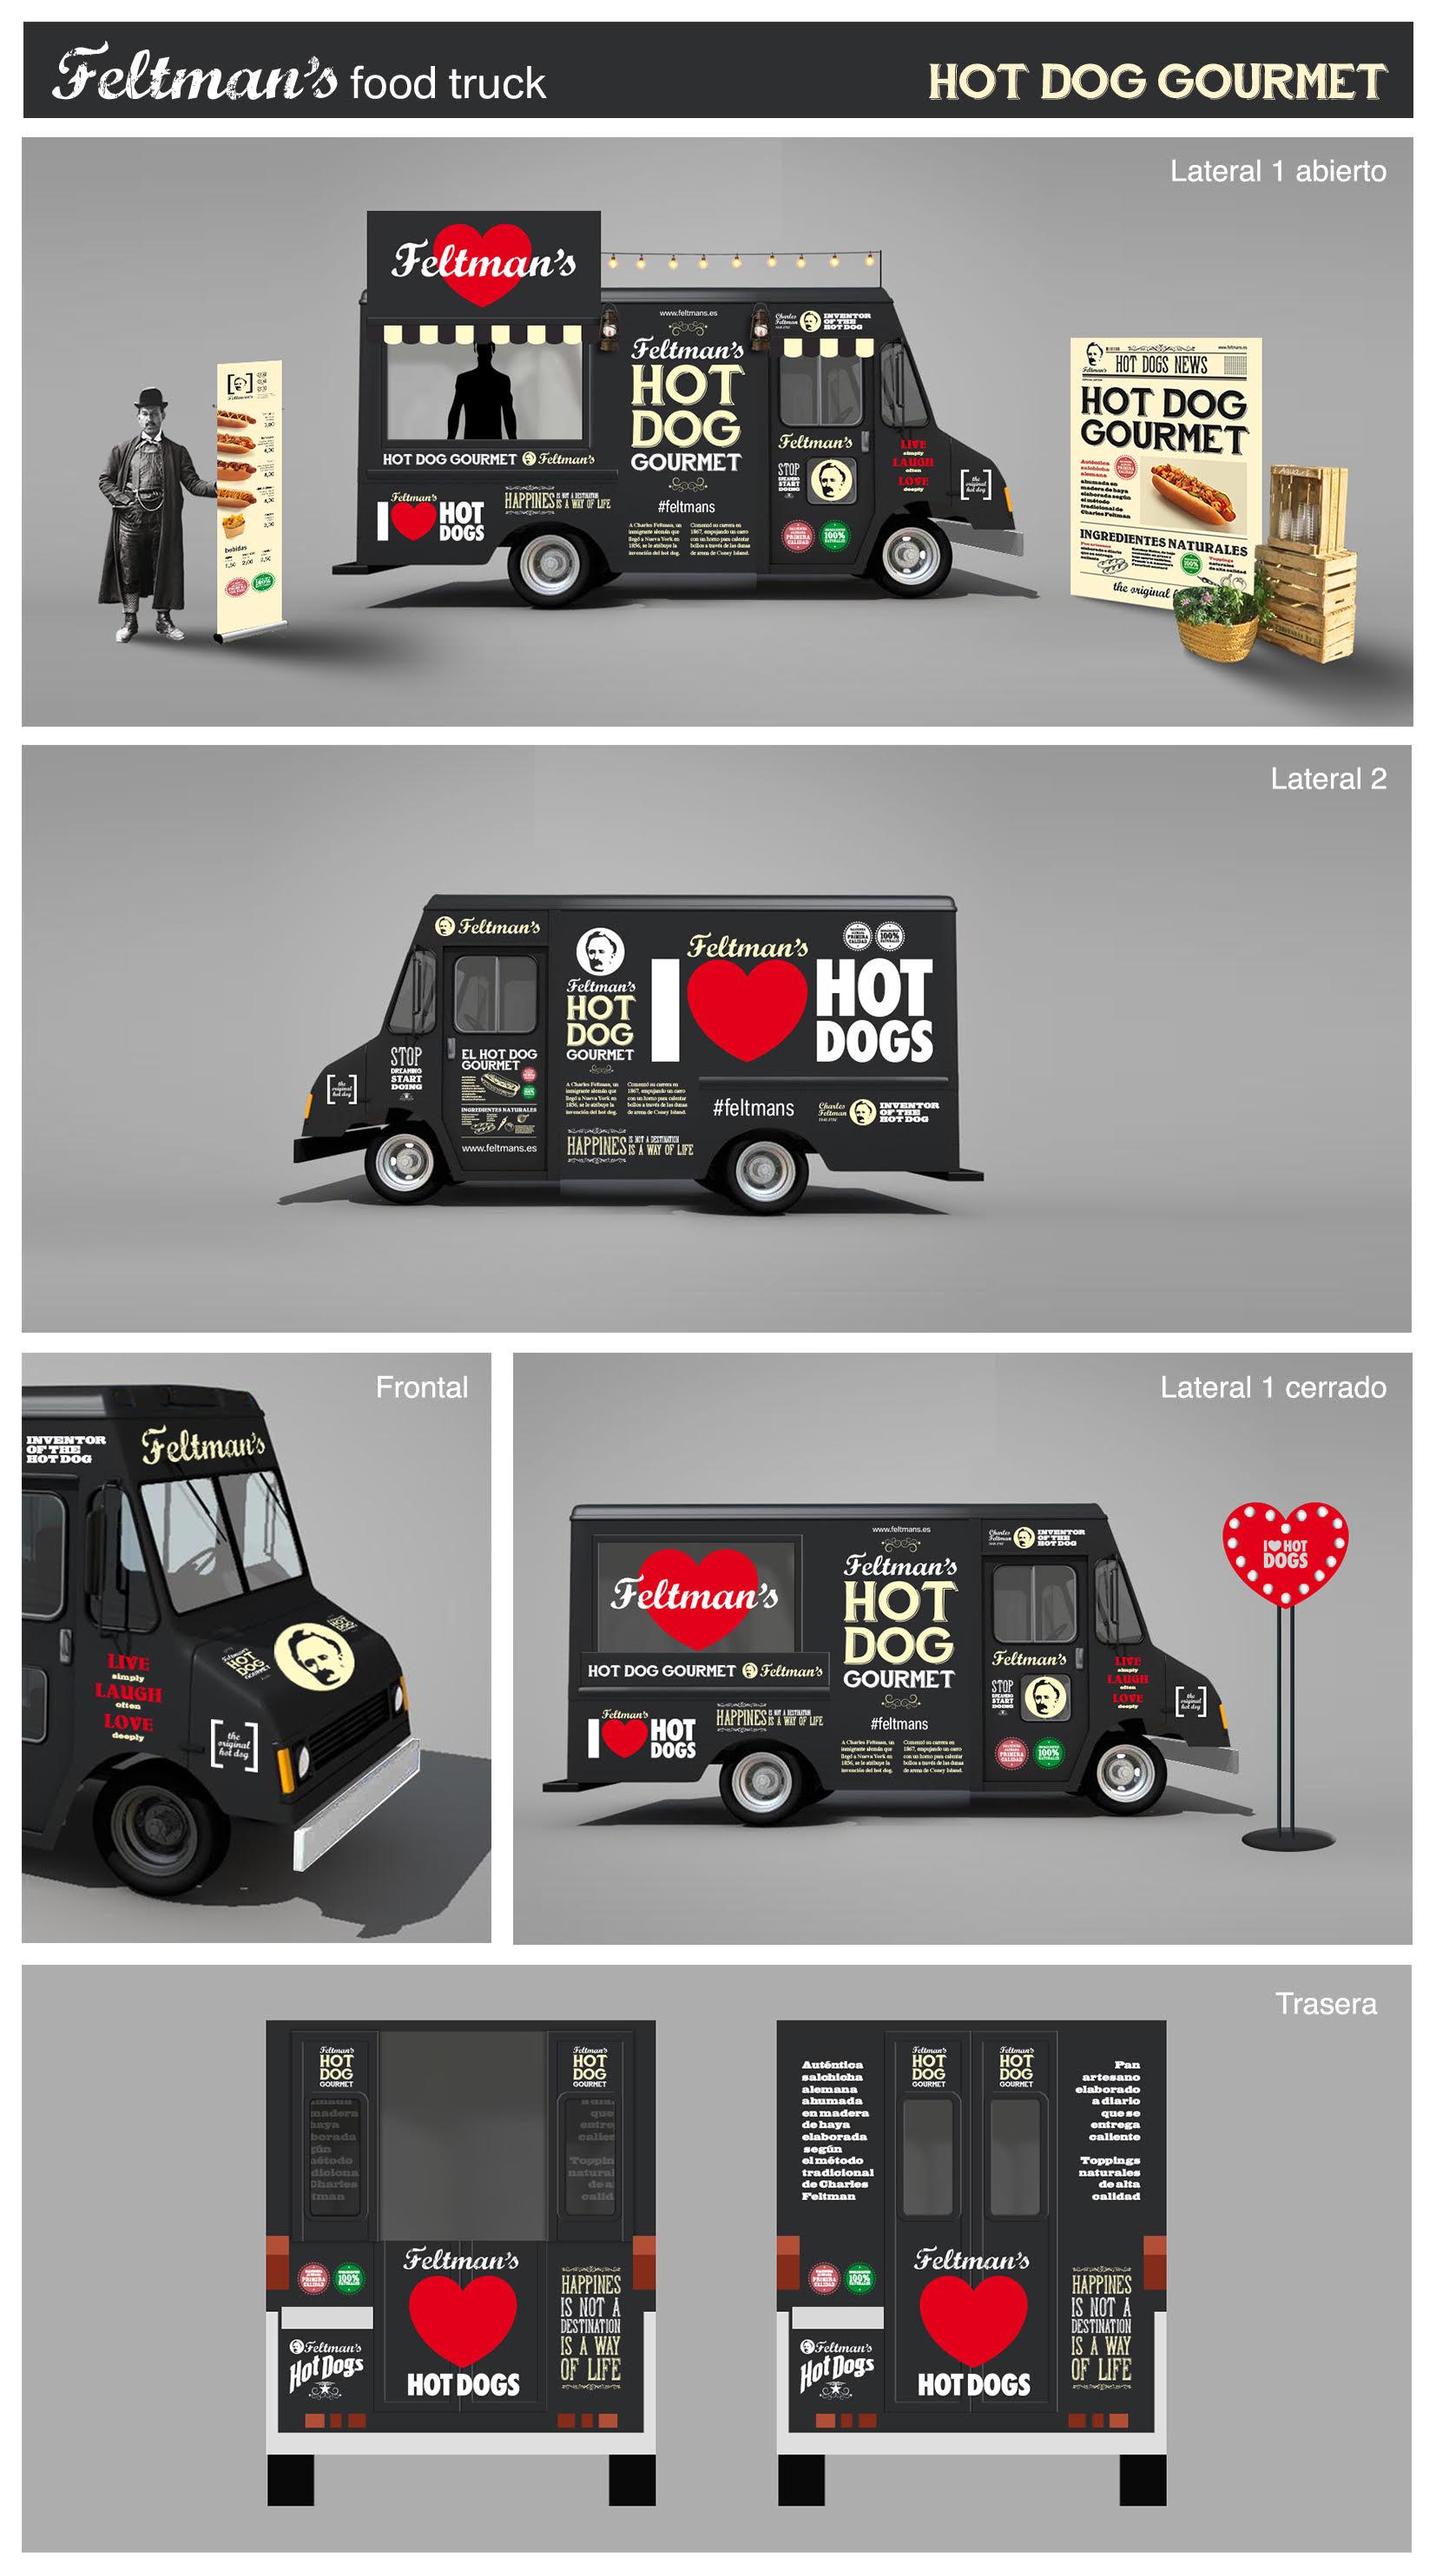 feltmans food truck